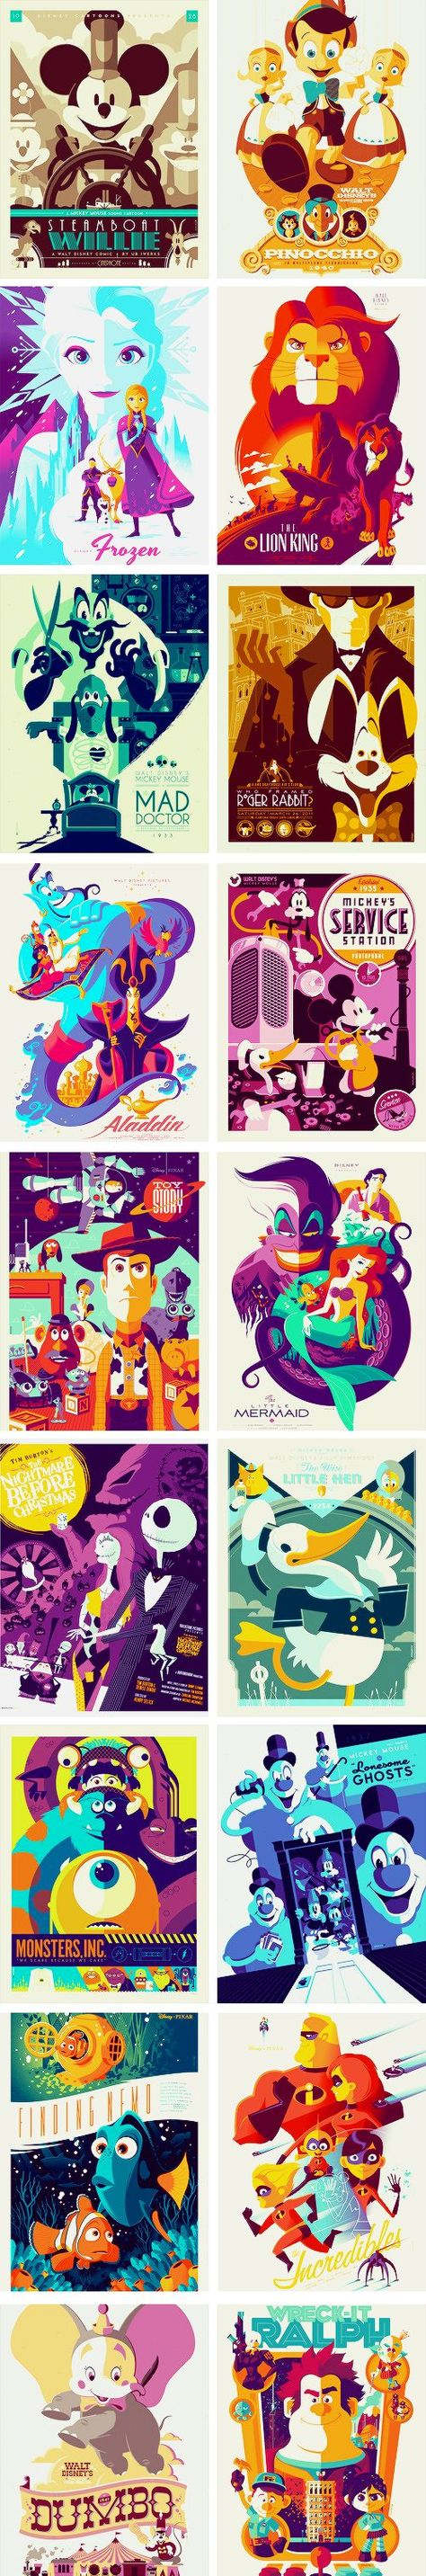 Disney posters by Tom Whalen. Talk Disney to me: http://skreened.com/ilovenetflix/talk-disney-to-me-5392736